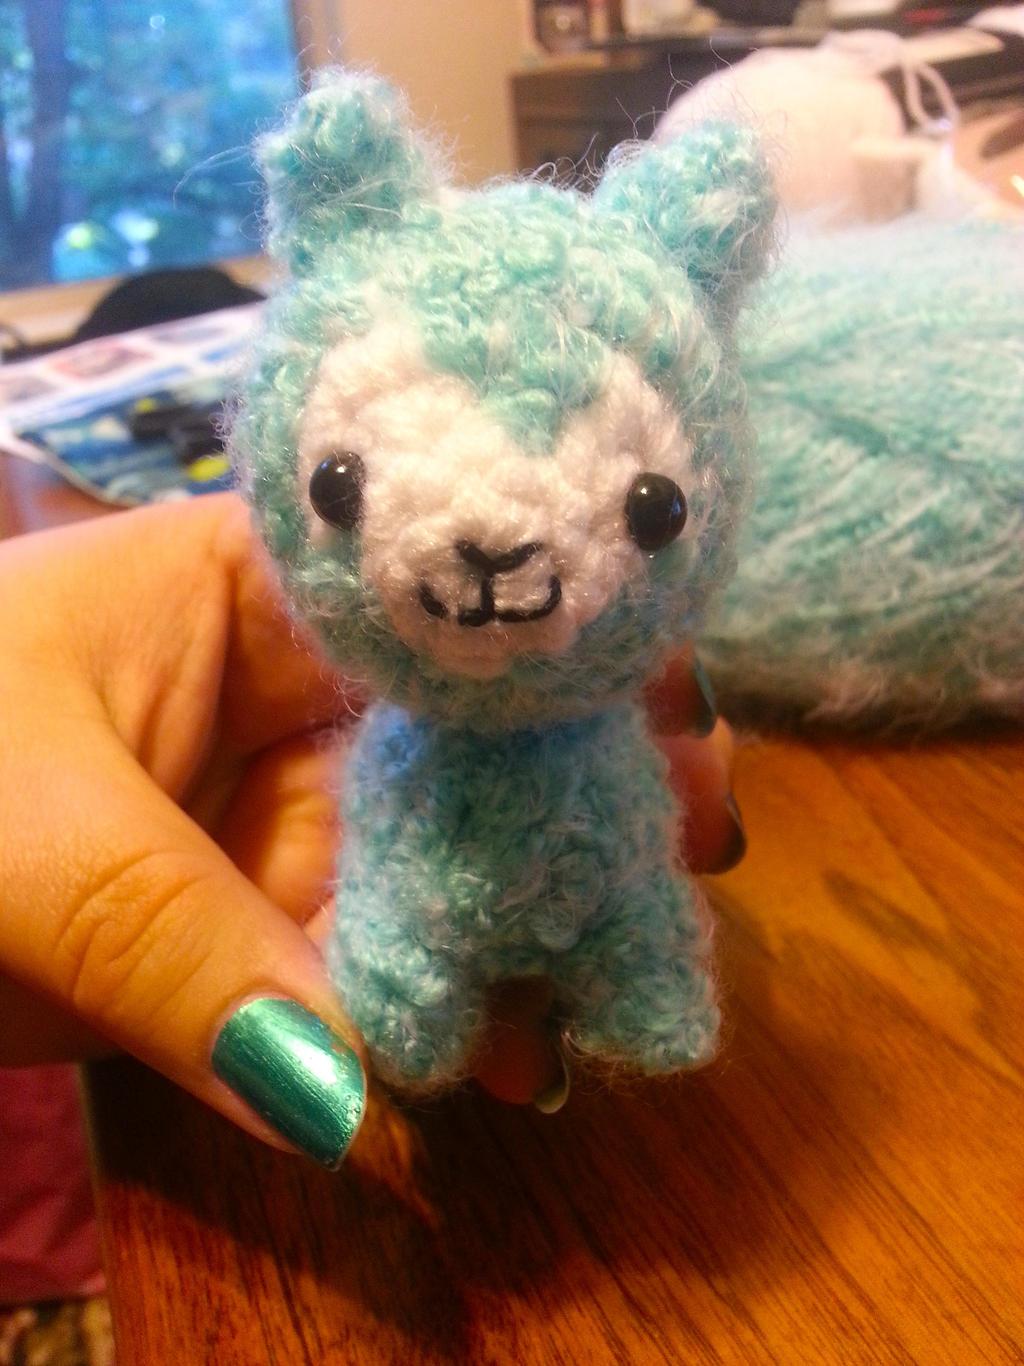 Amigurumi Alpaca : Arpakasso Alpaca Llama Amigurumi 2 by Spudsstitches on ...